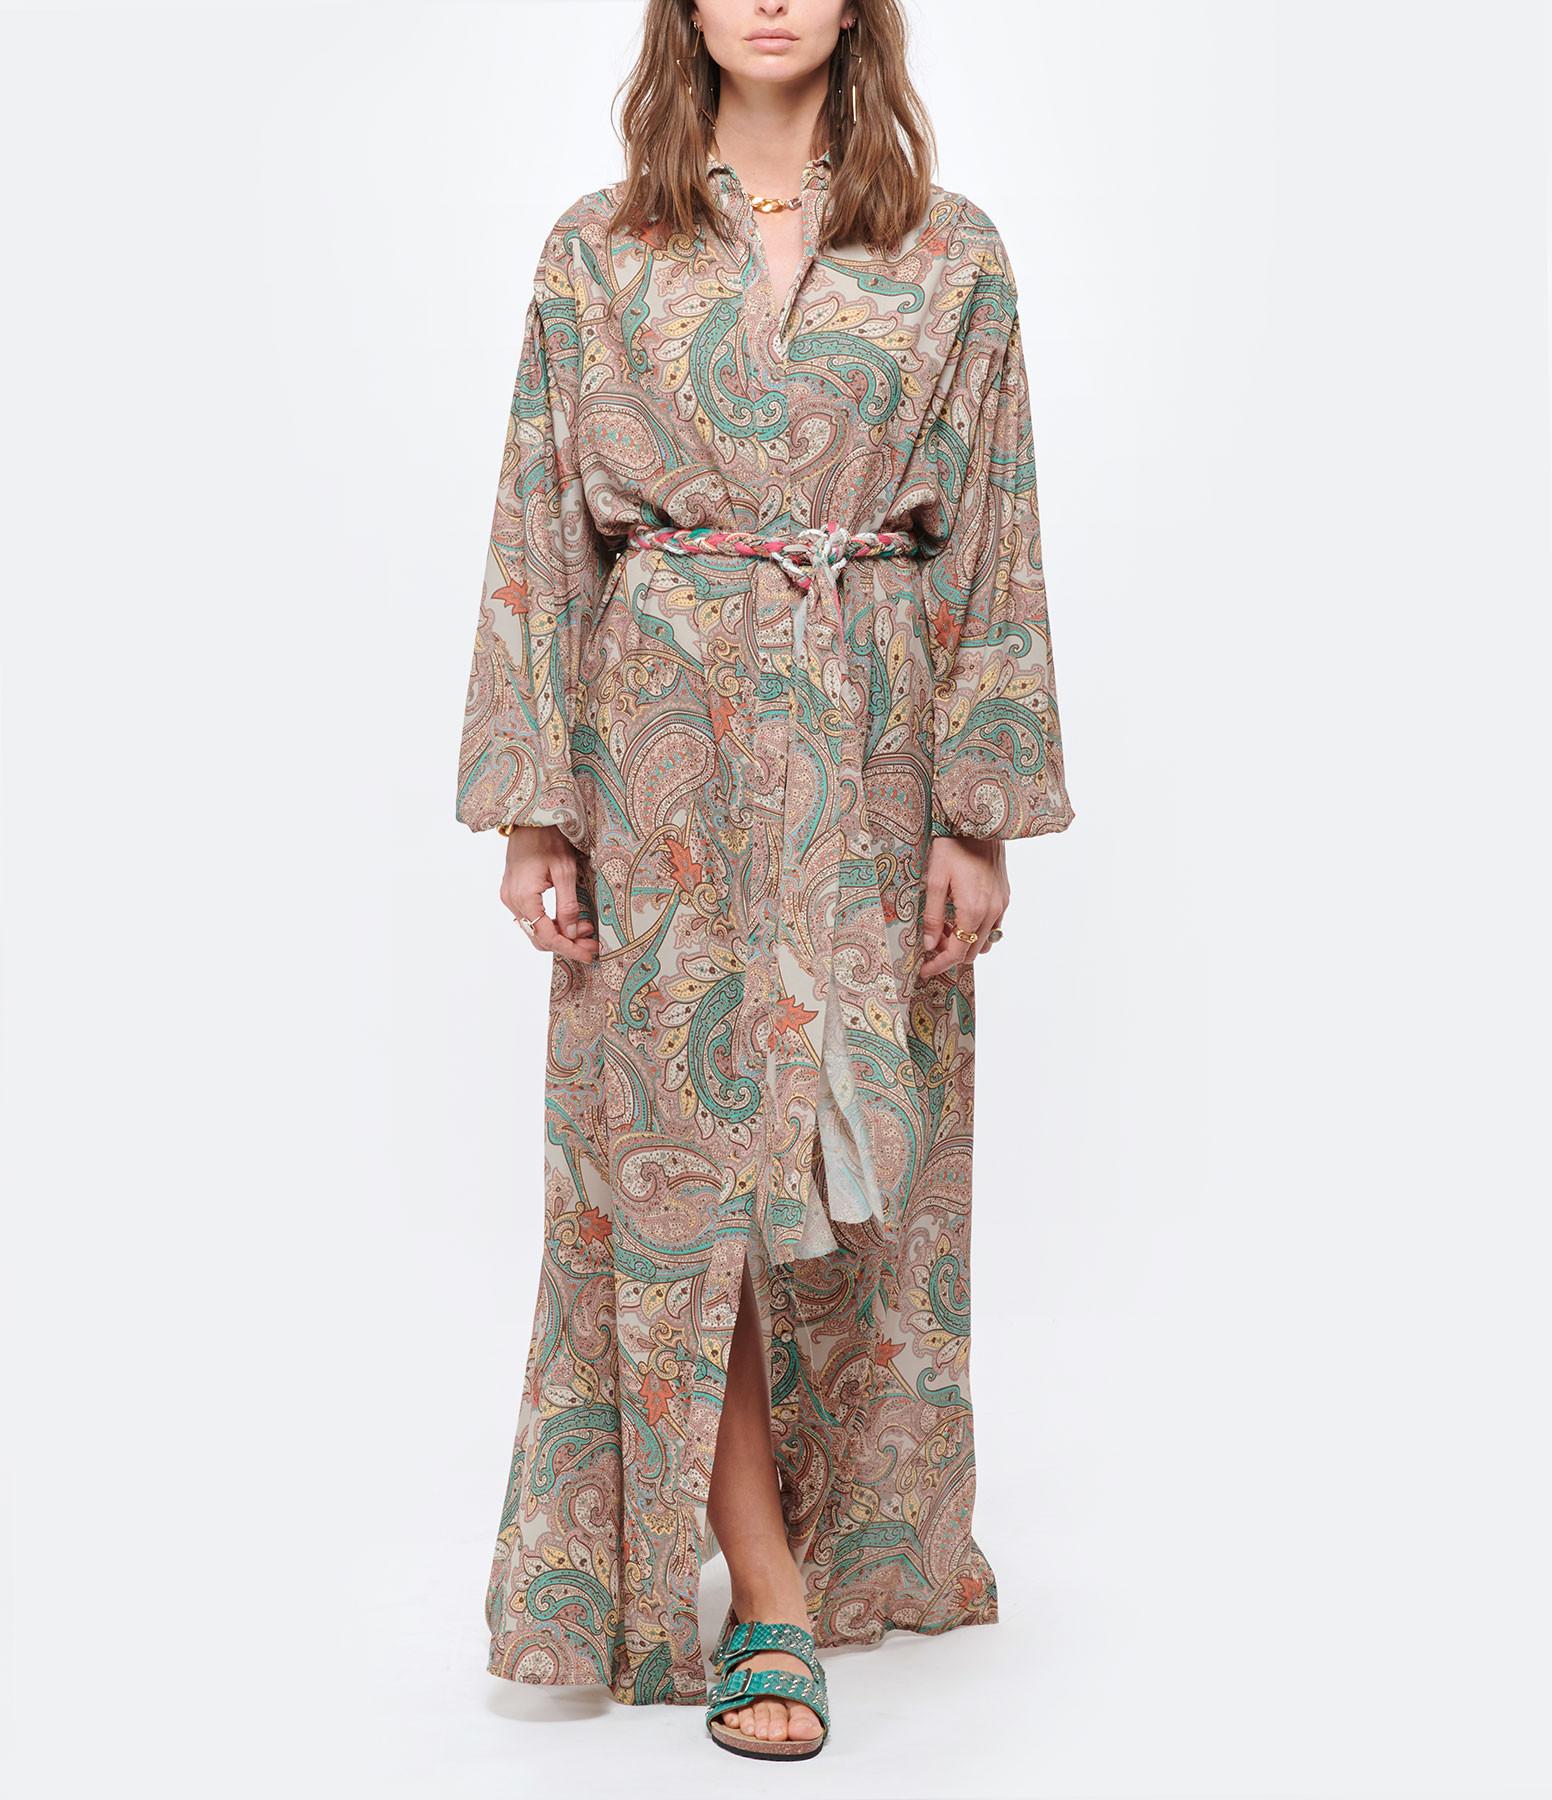 MAISON HAUSSMANN - Robe Crêpe Gwalior Sand Imprimé